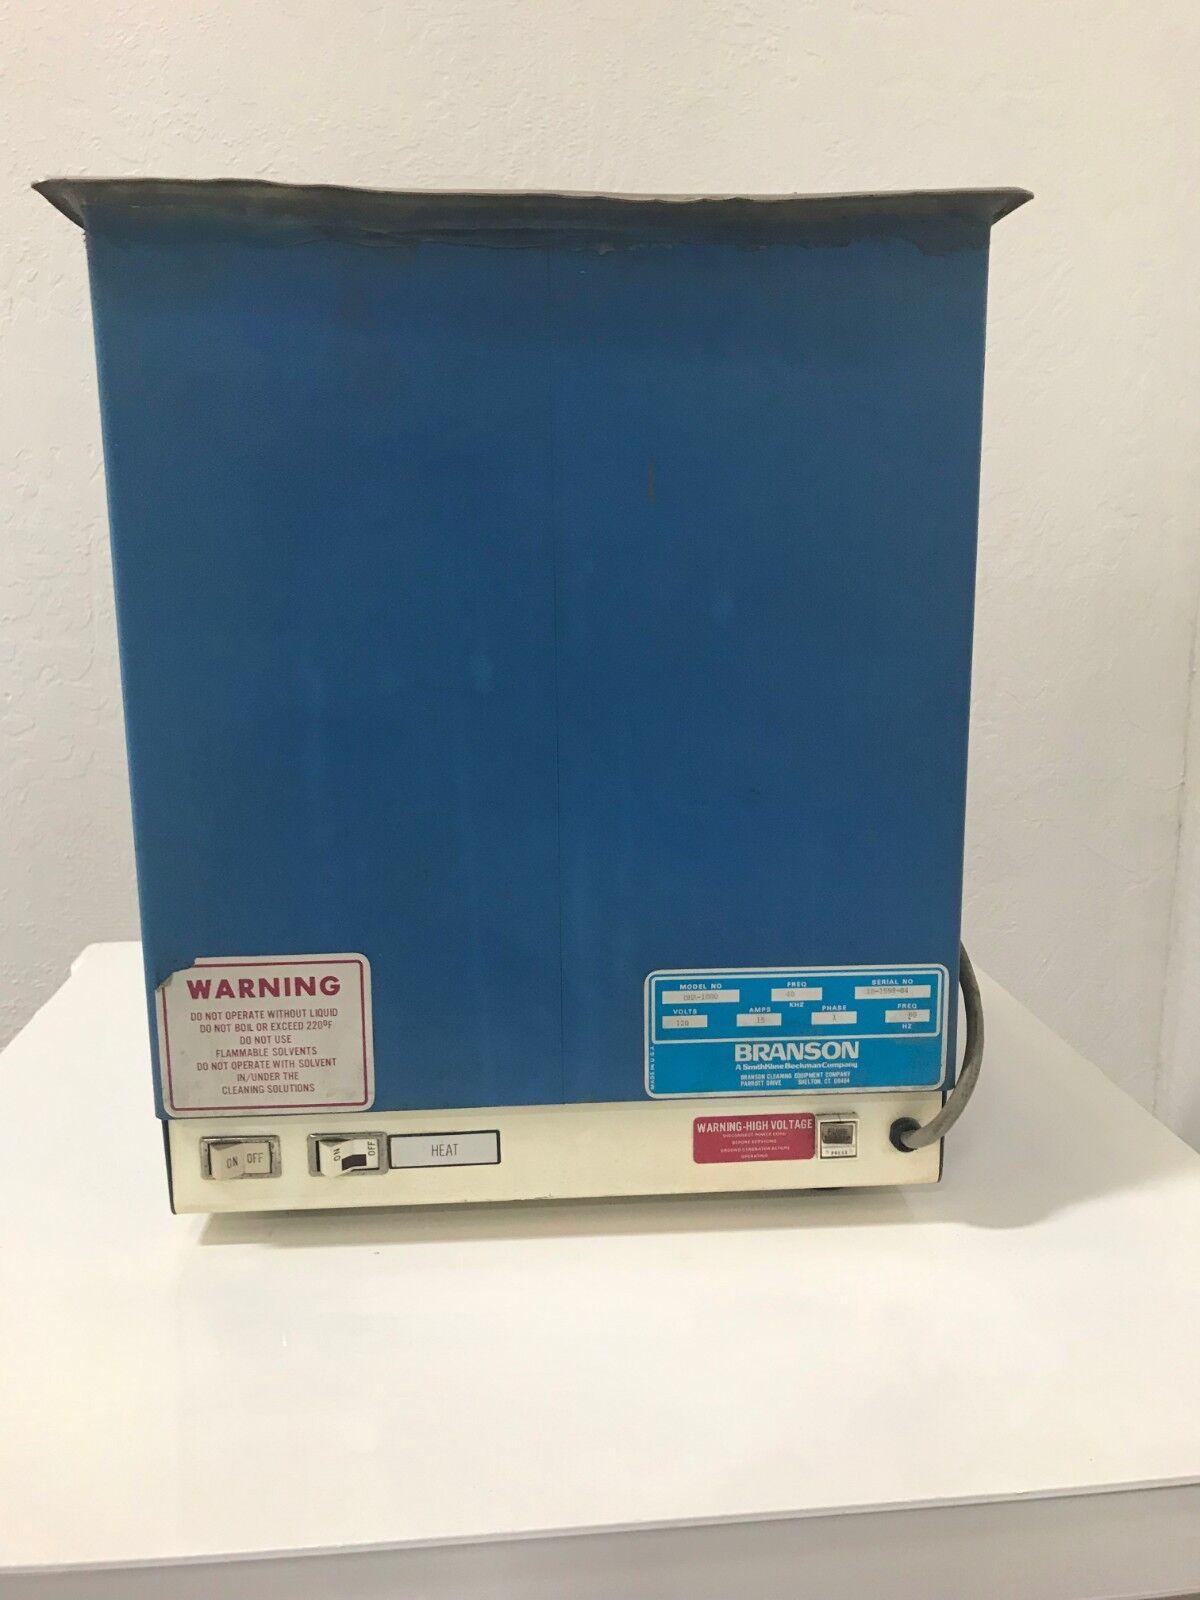 BRANSON DHA-1000 HEATED ULTRASONIC CLEANER 10 GALLON